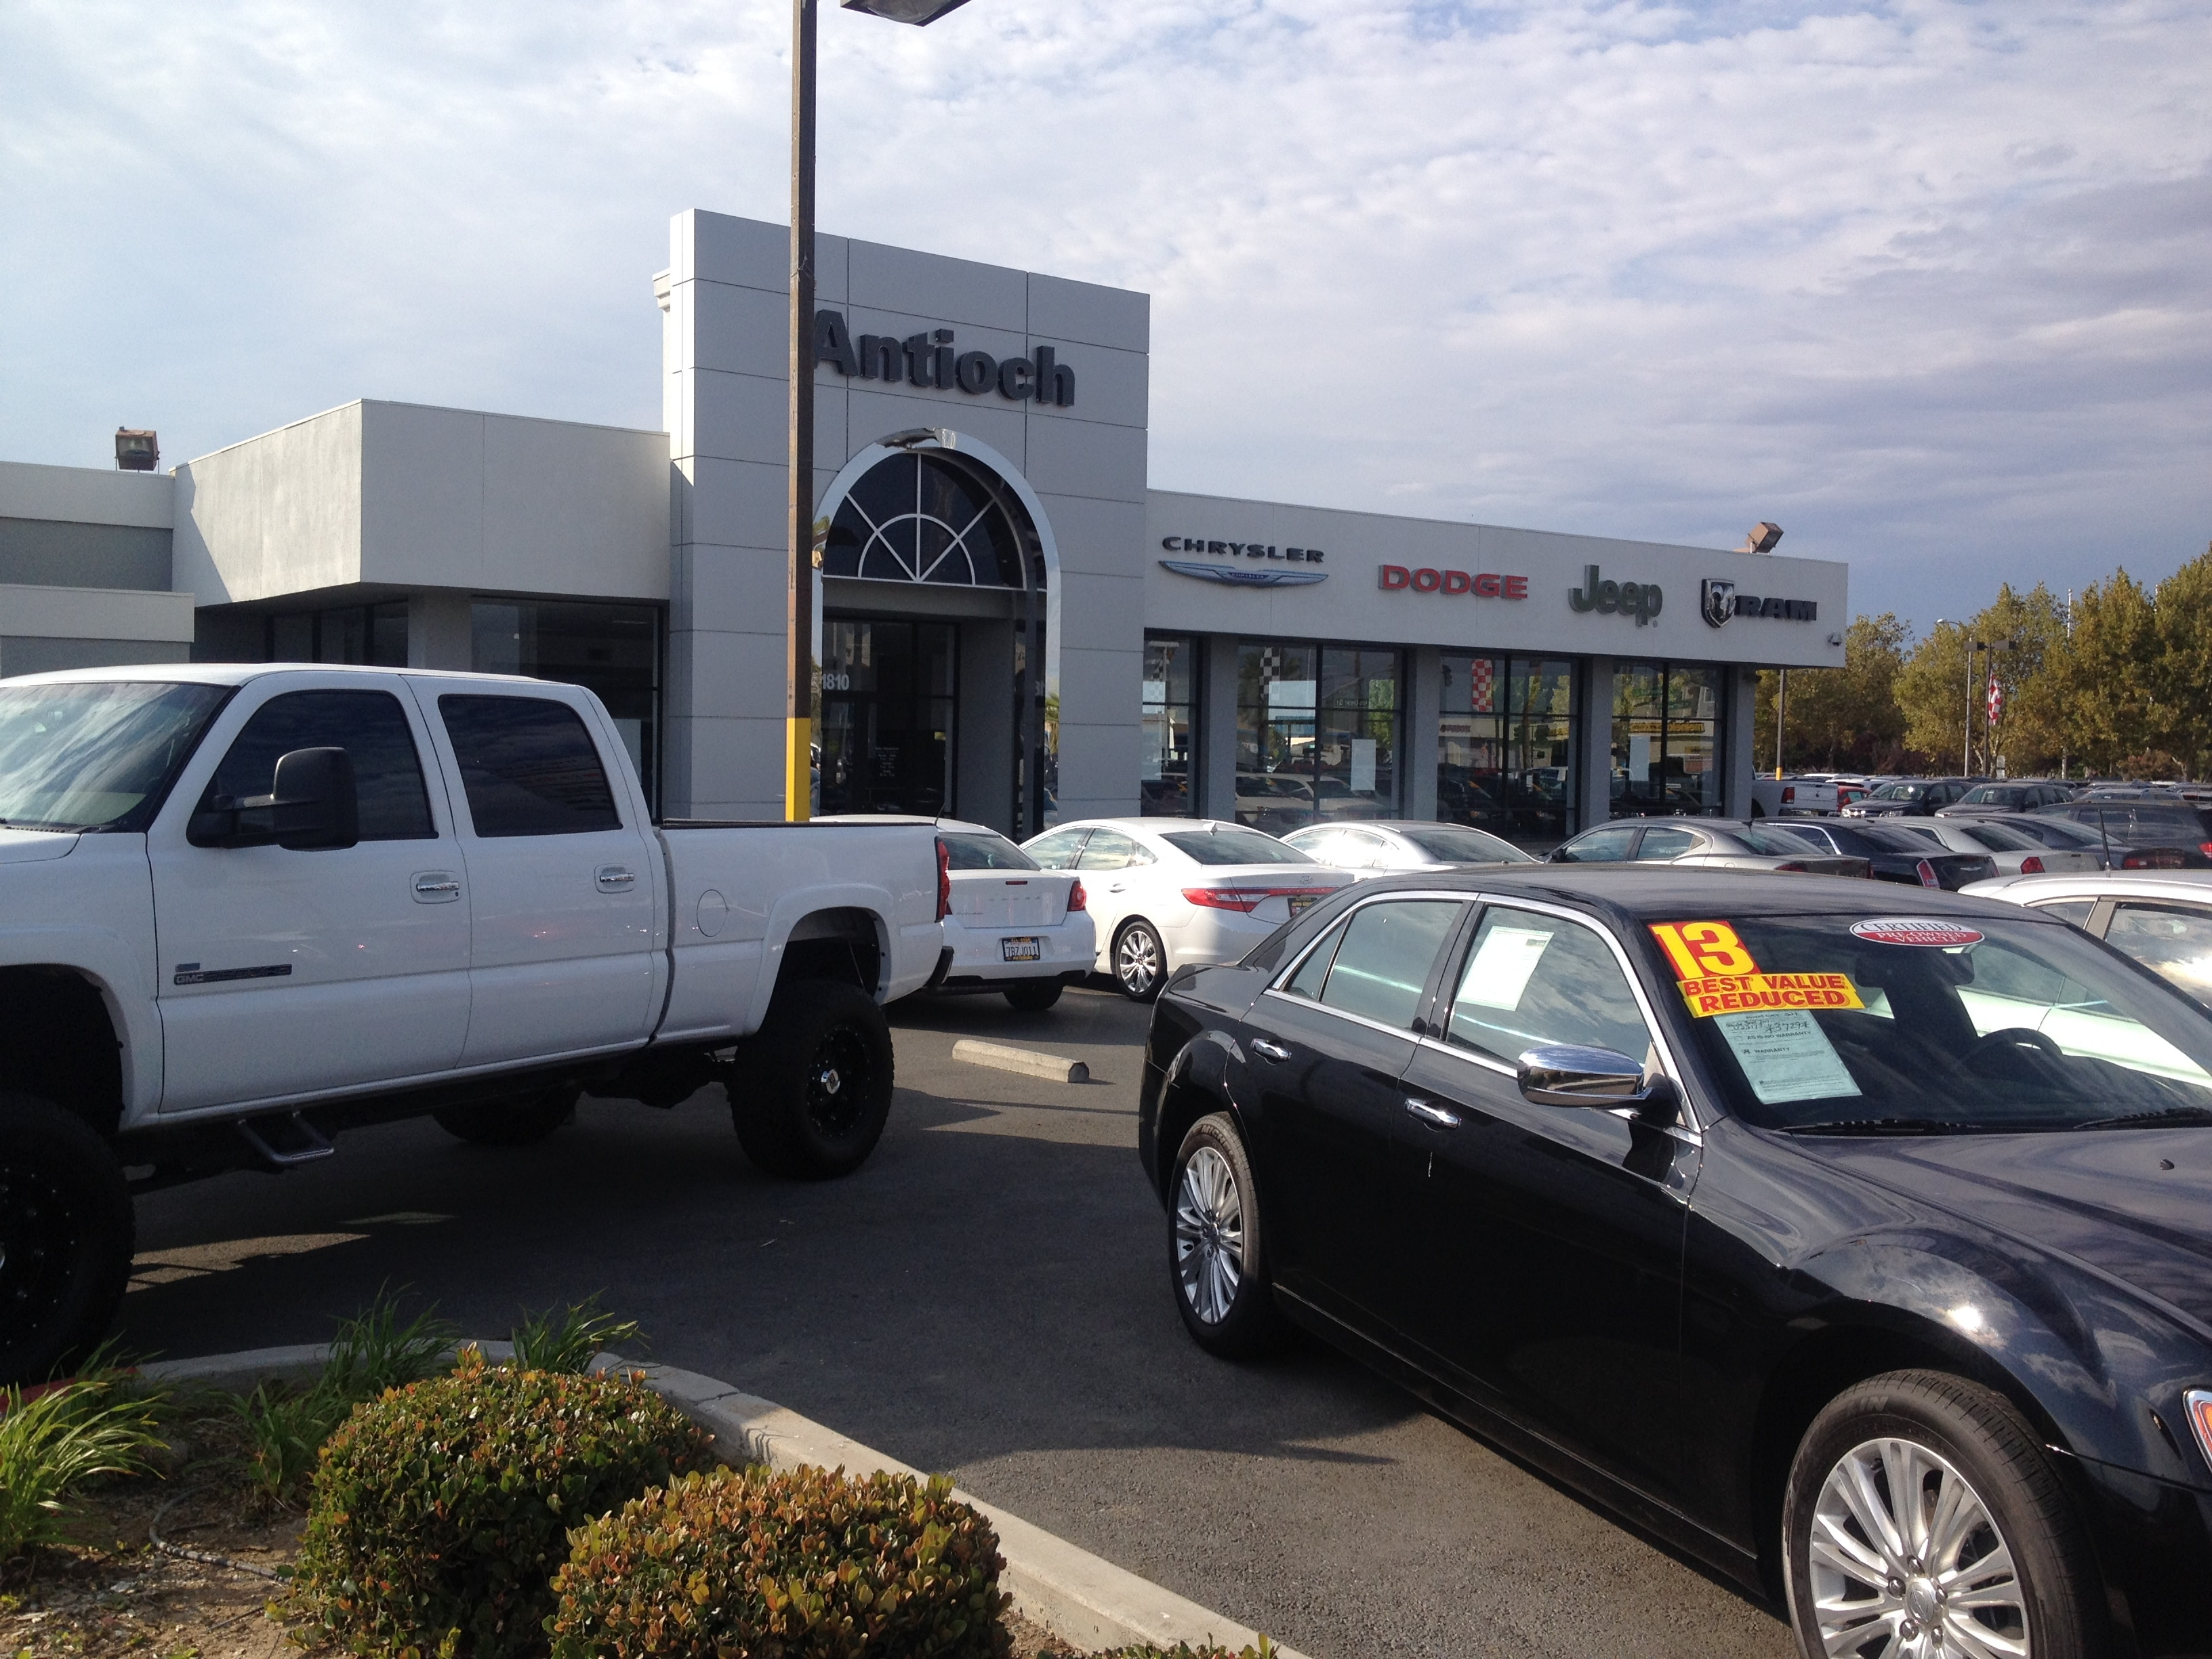 Antioch Chrysler Jeep Dodge.jpg